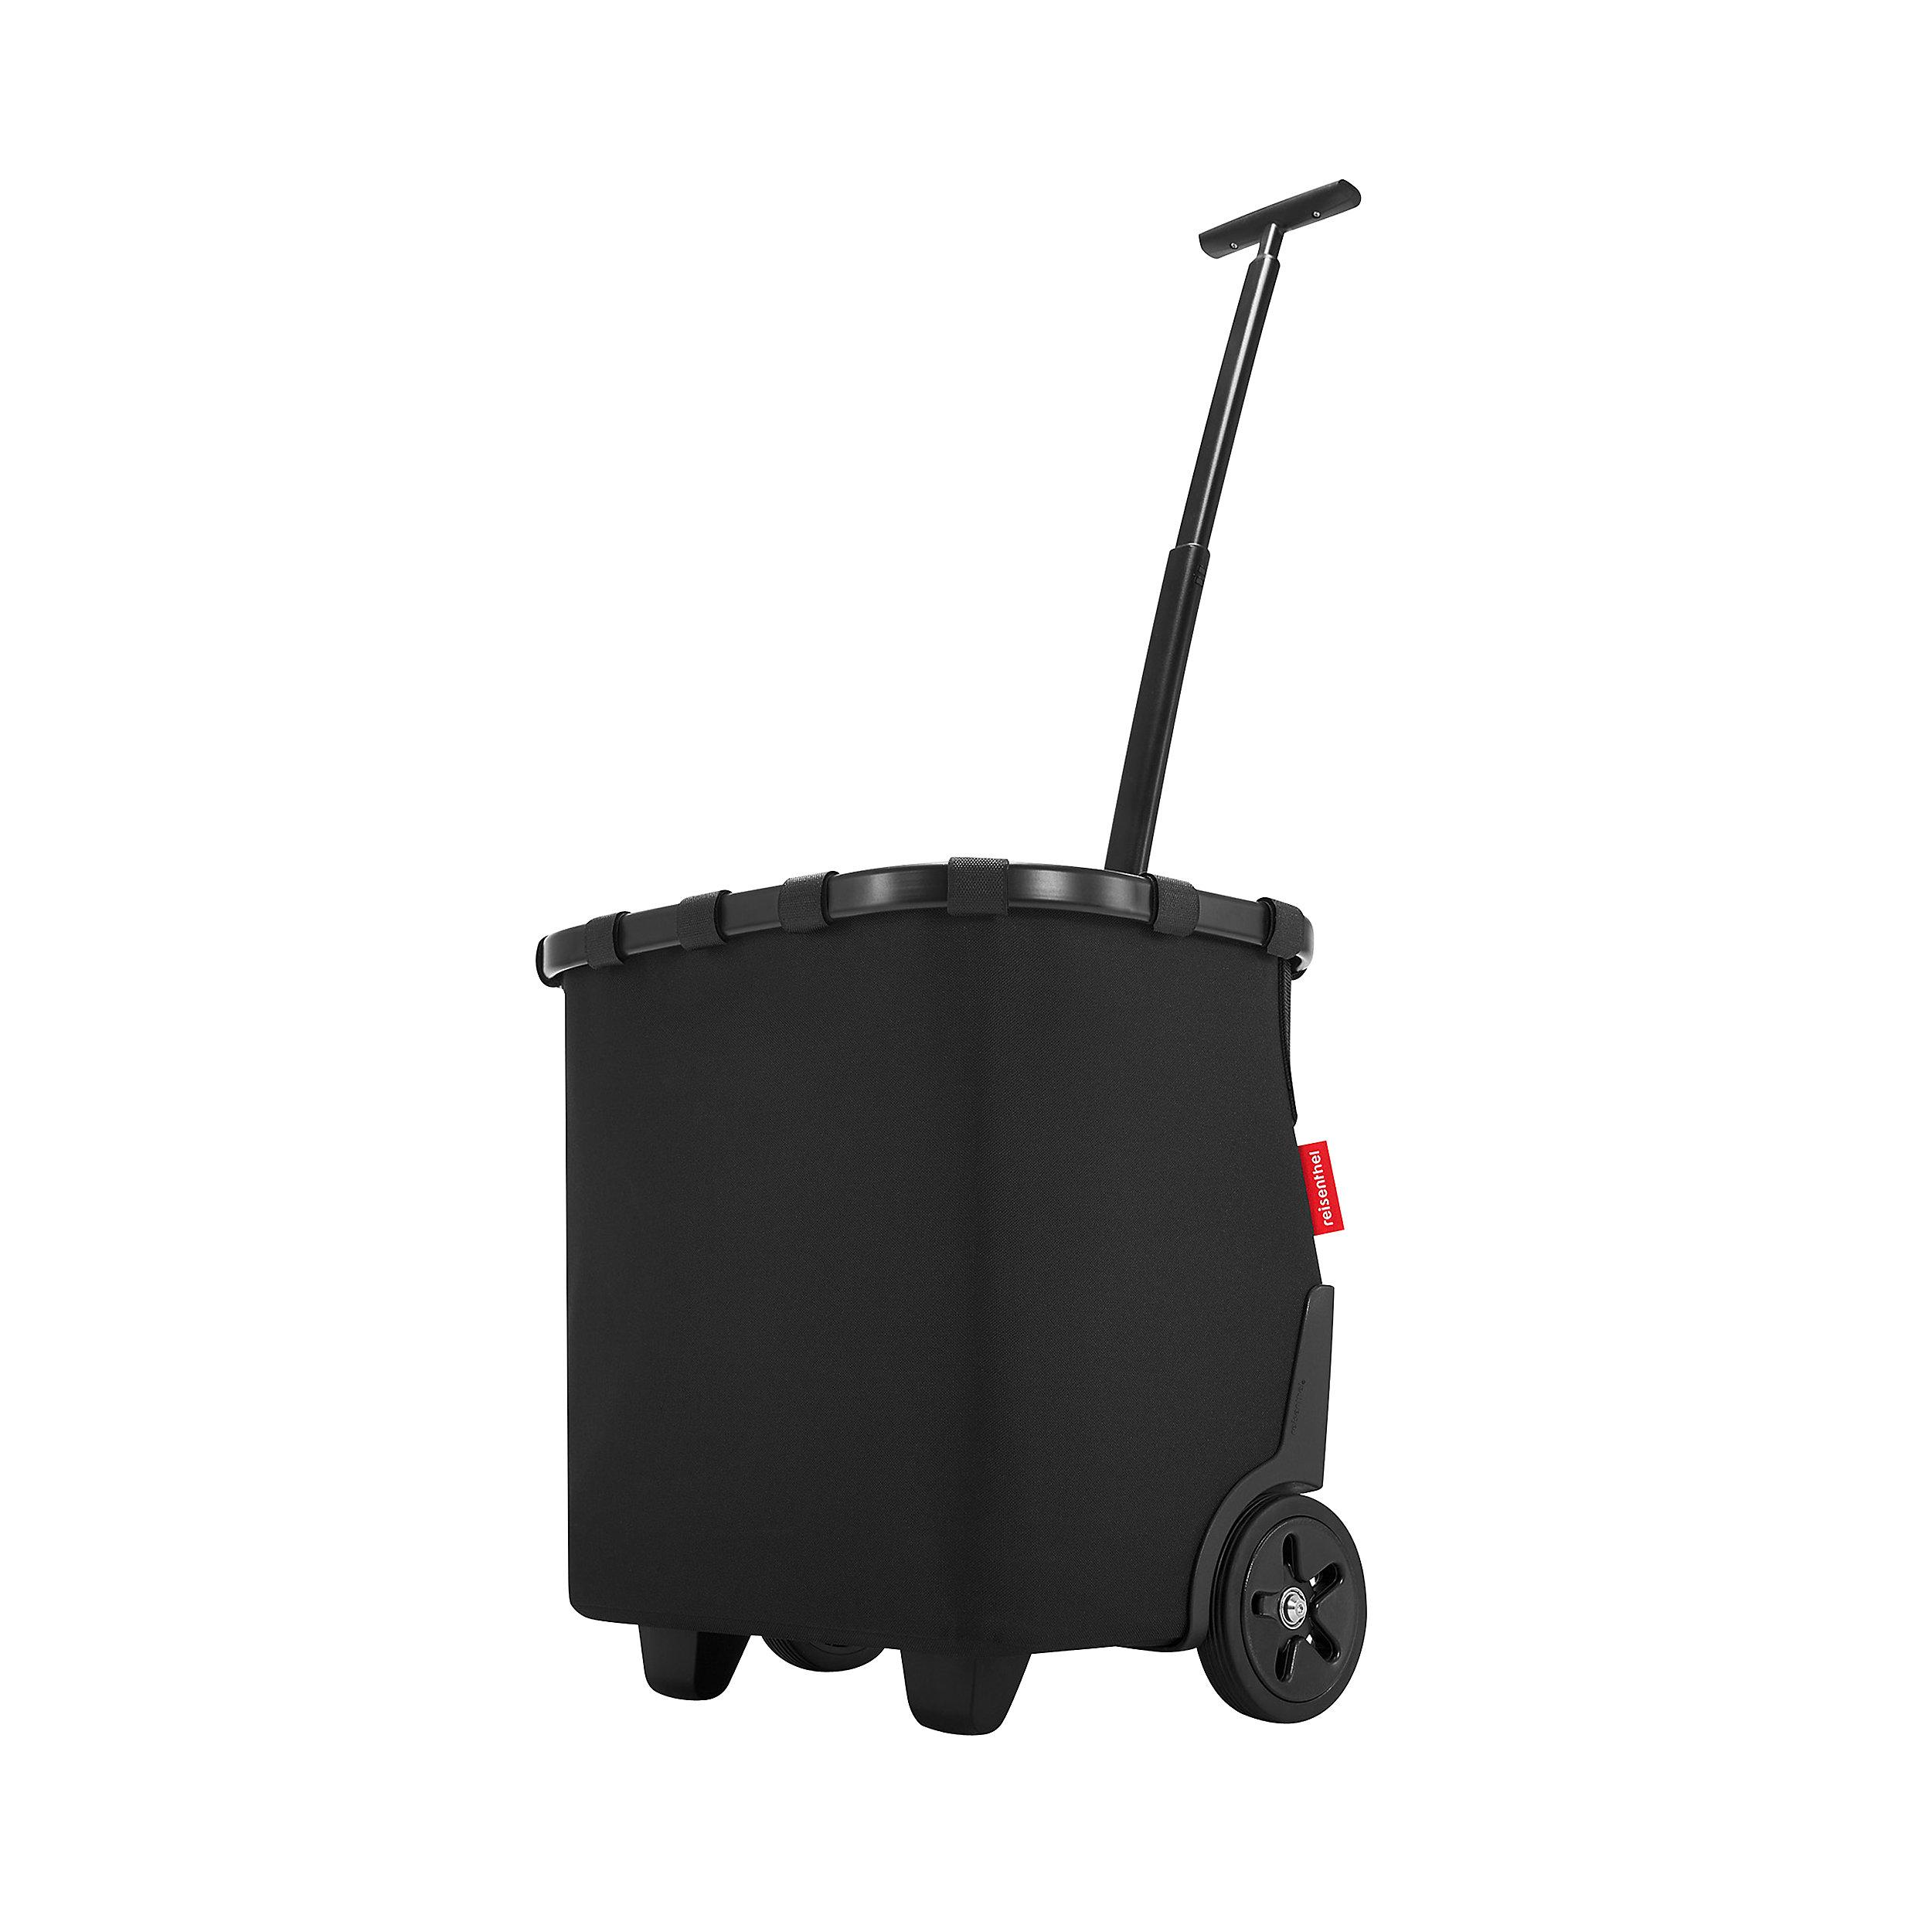 Carrycruiser with 2 wheels Frame Shopping 40 Liter